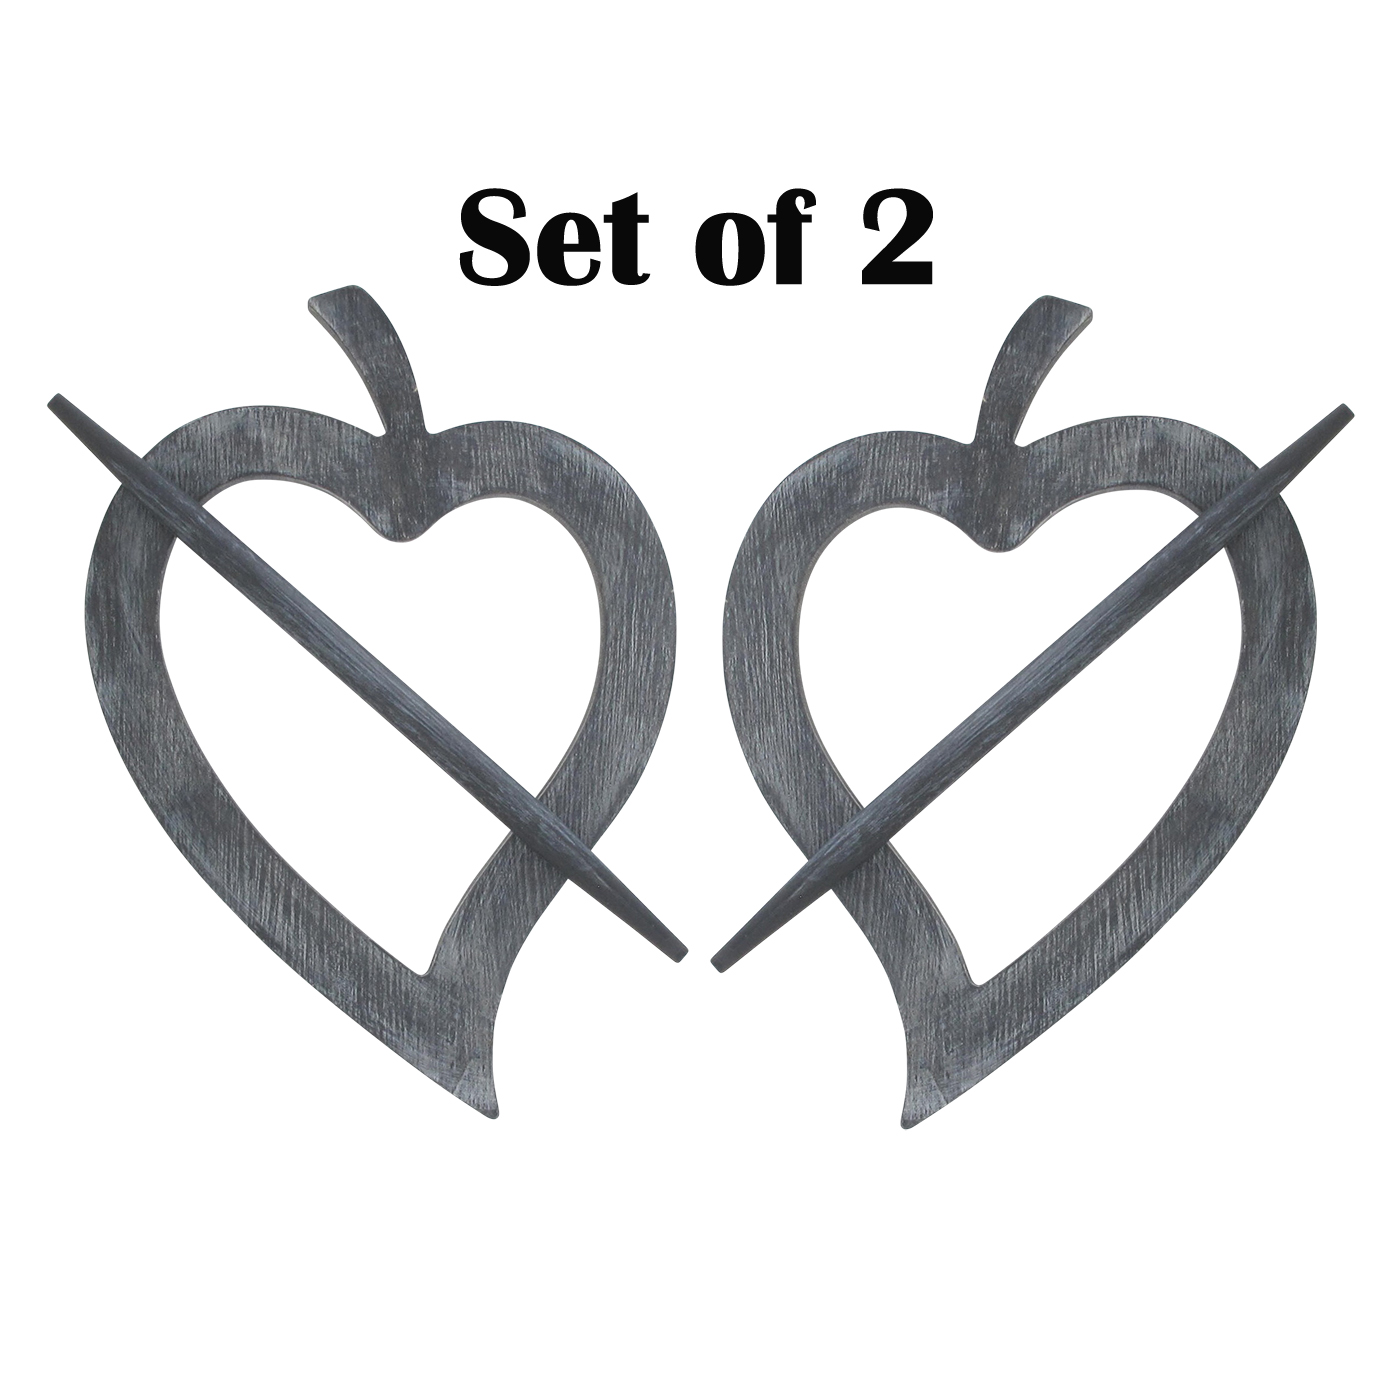 Set of 2 Wooden Heart Tieback Fjord Big Size